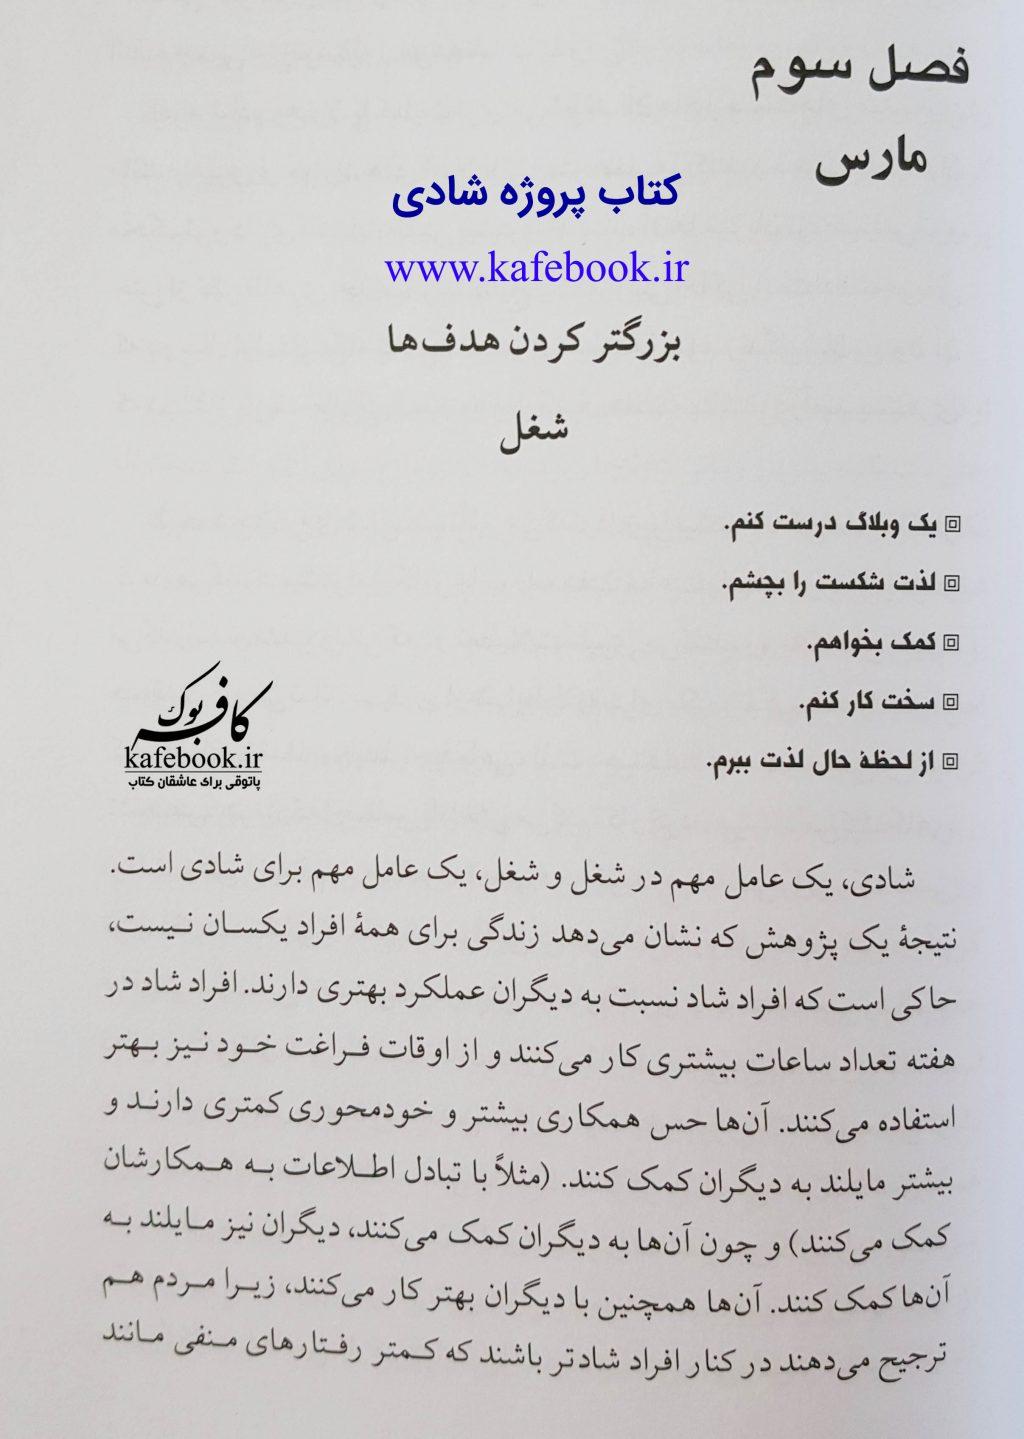 کتاب پروژه شادی - خلاصه کتاب پروژه شادی از نشر آموت